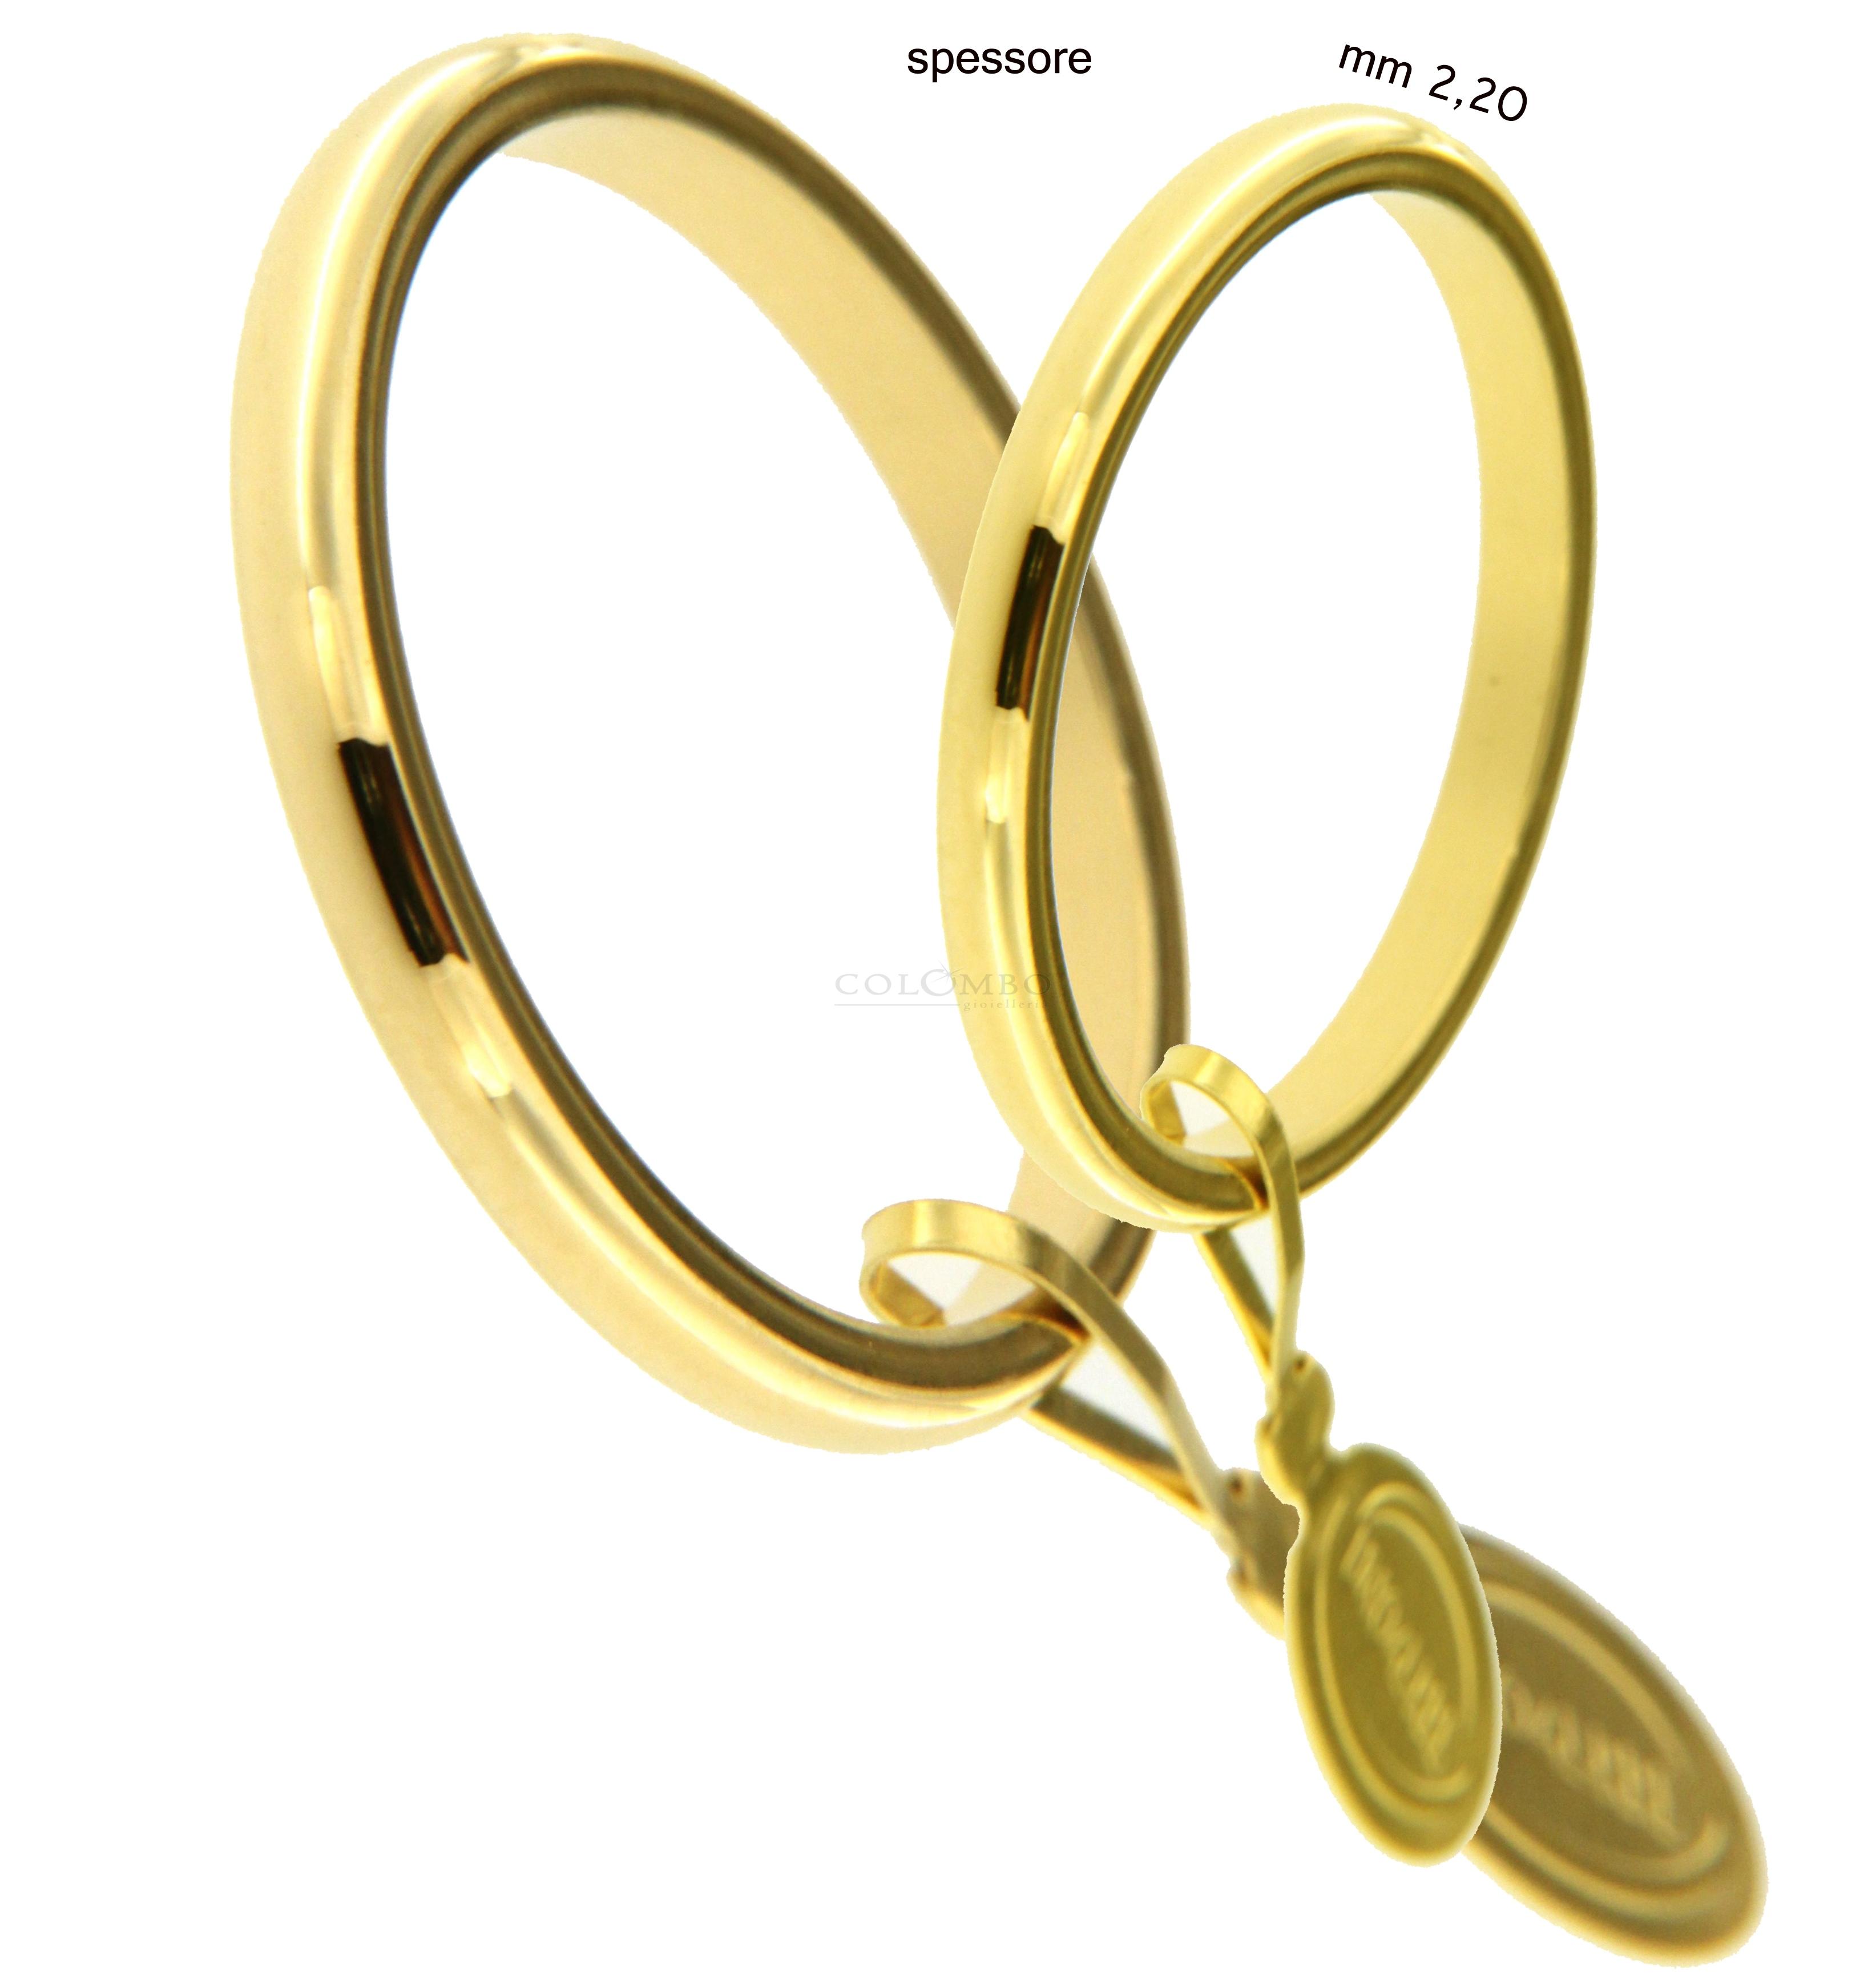 Fedi nuziali francesina oro giallo